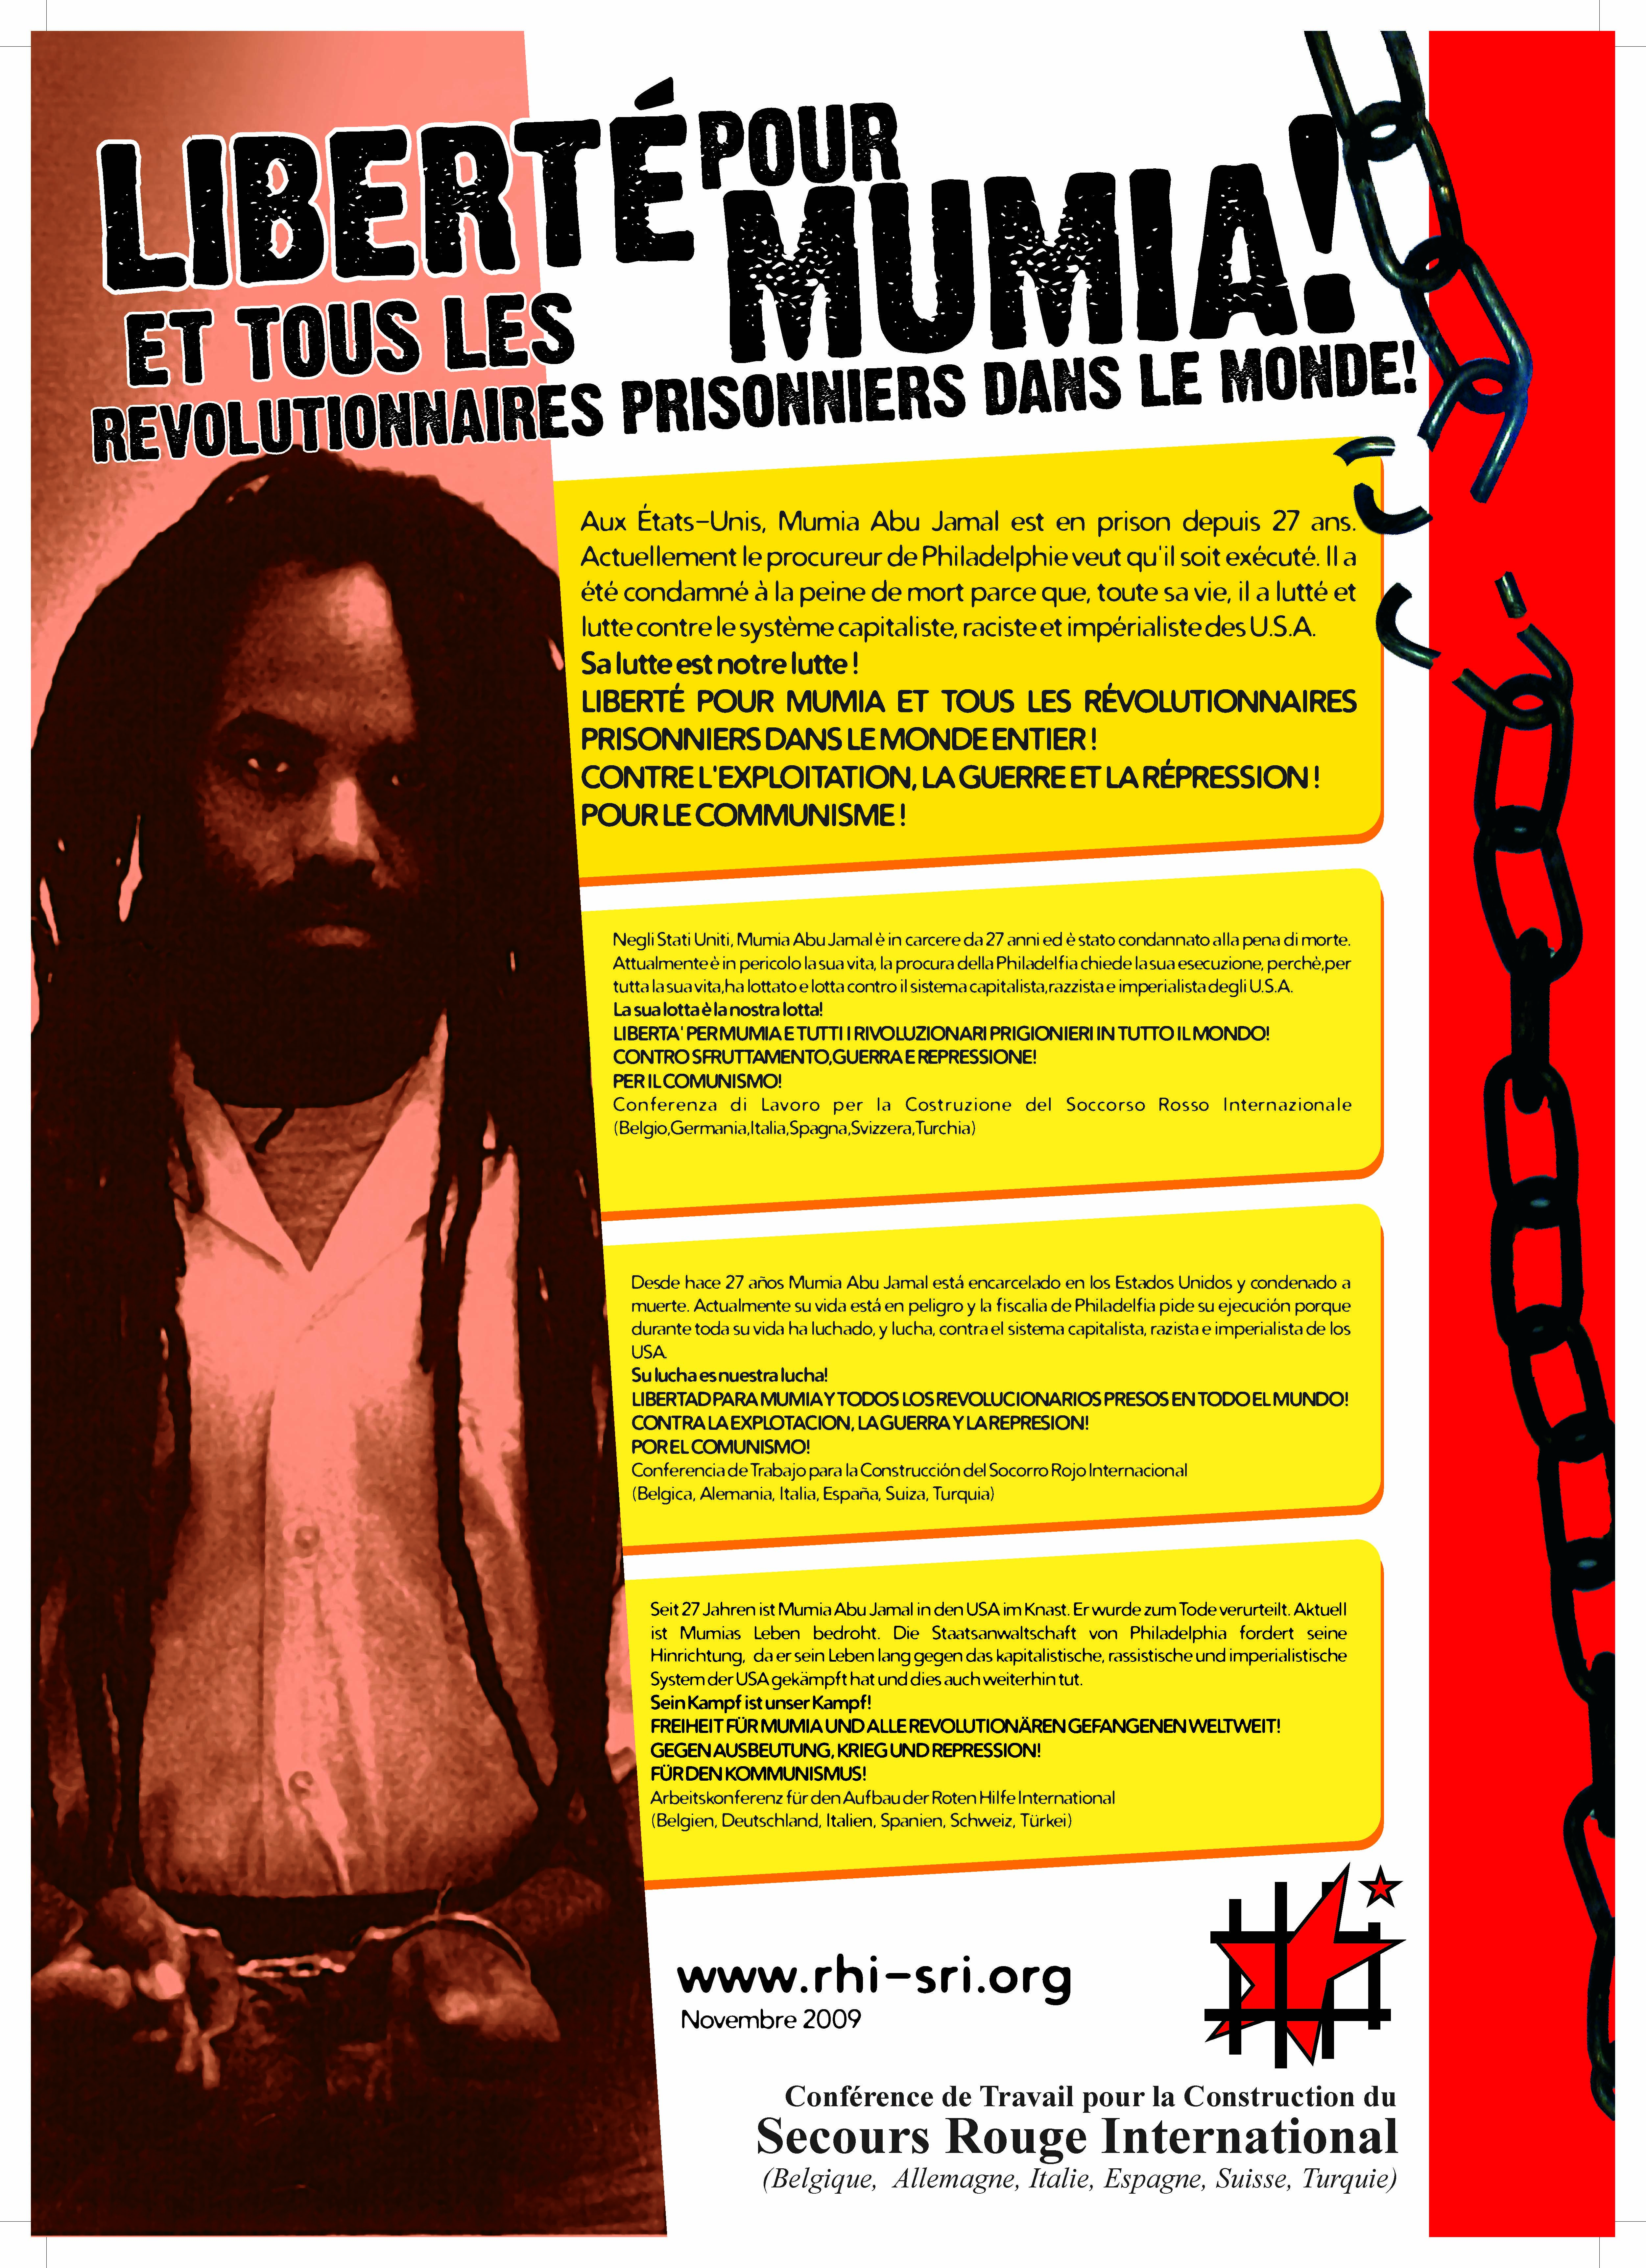 Freedom for Mumia